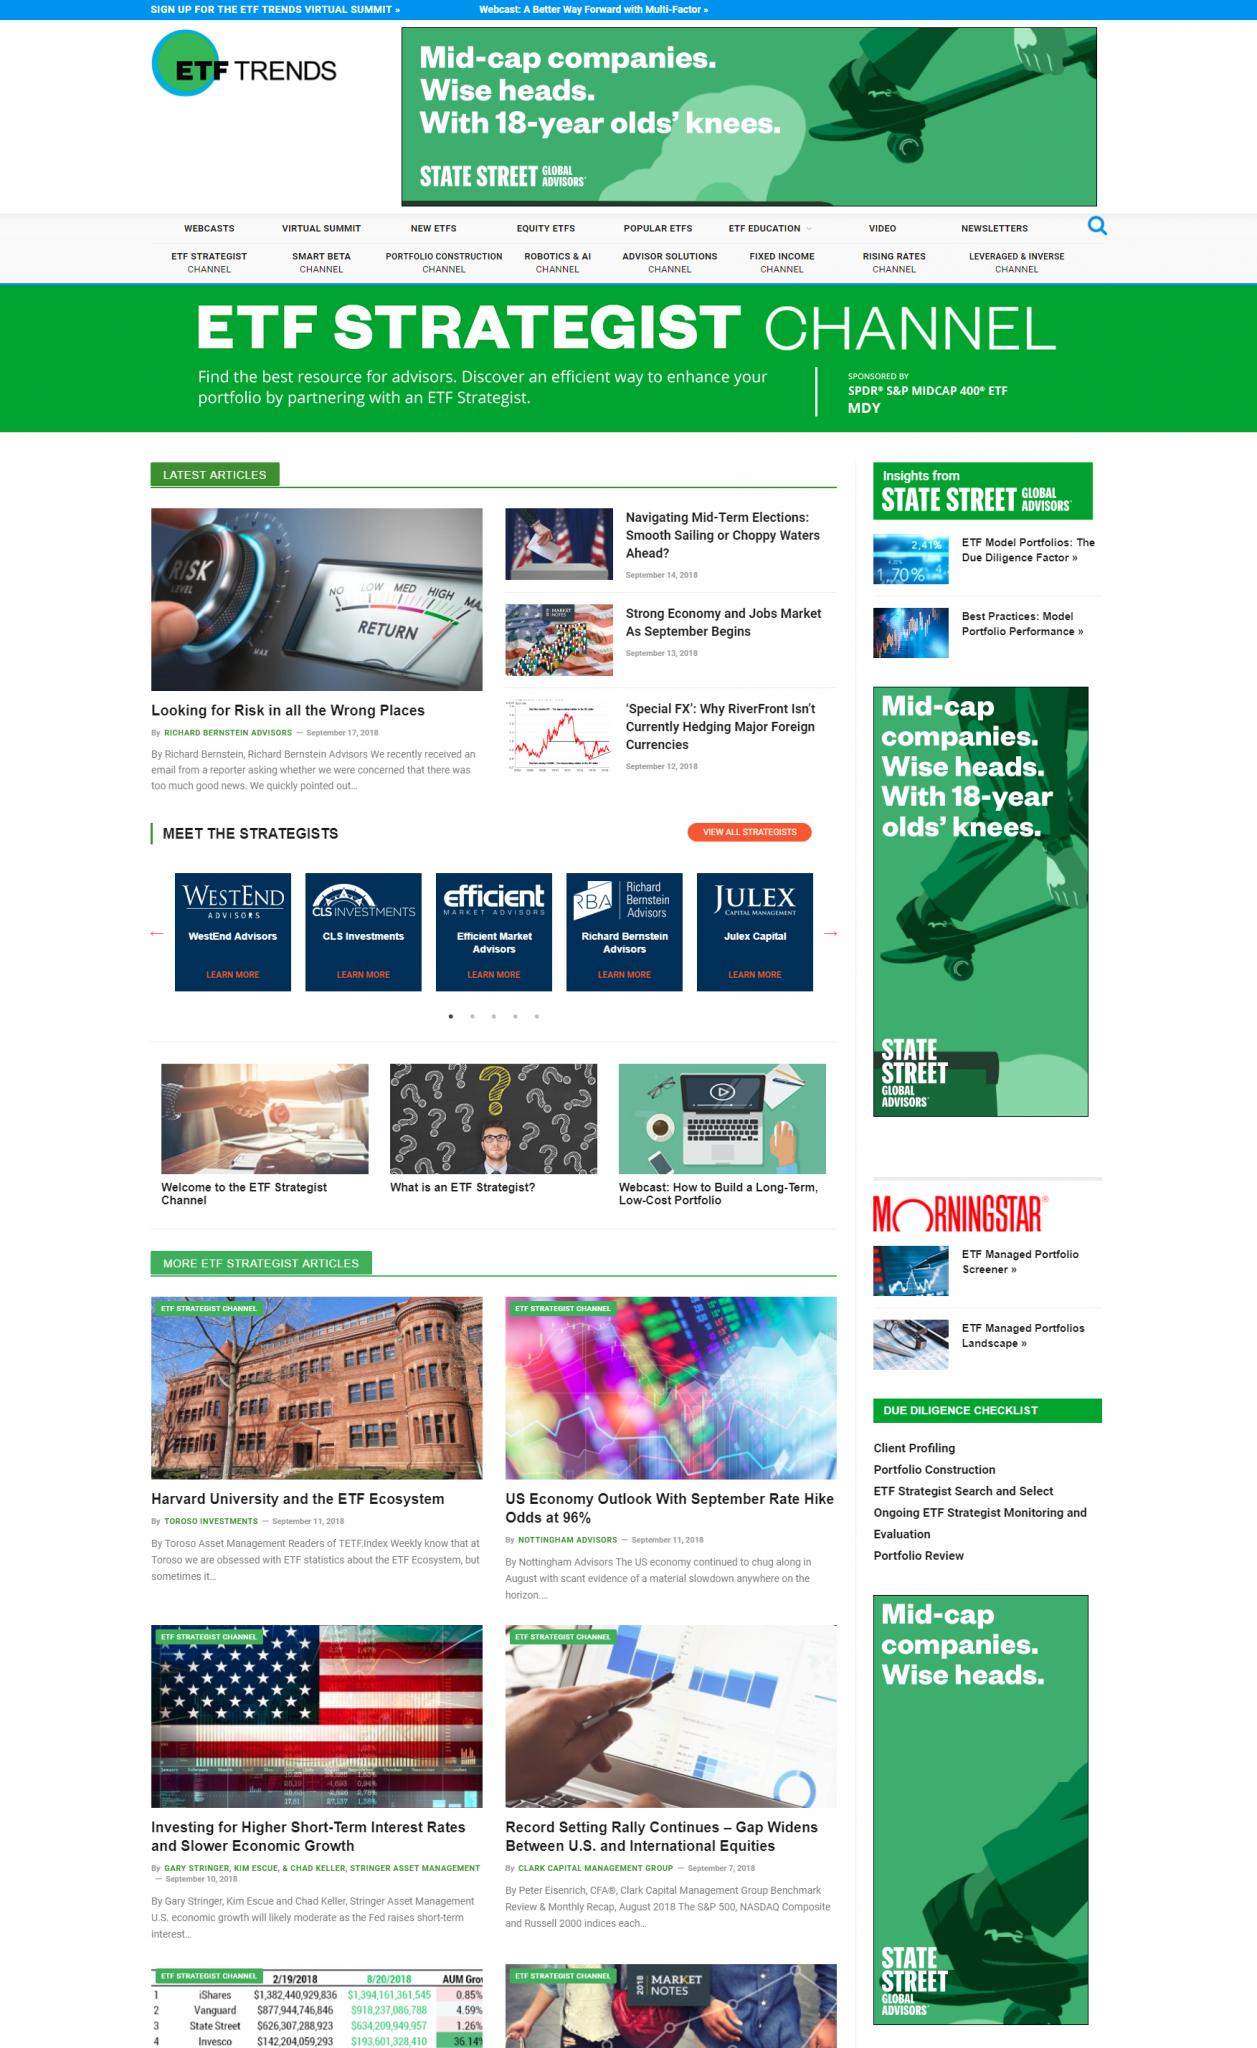 ETF Strategist Channel homepage